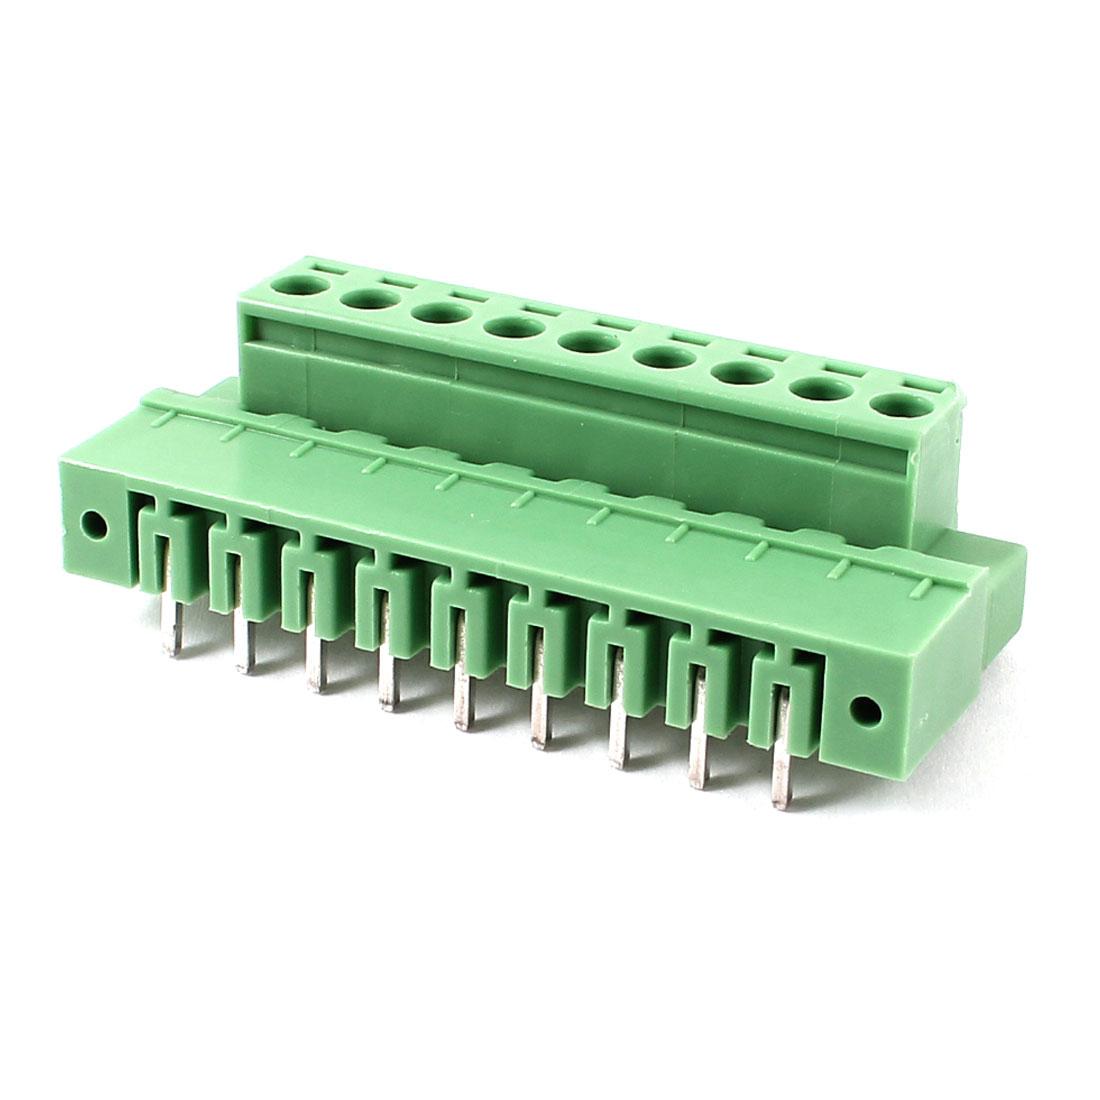 Pair AC 300V 10A 5.08mm Pitch 9 Pin Screw Pluggable Terminal Block